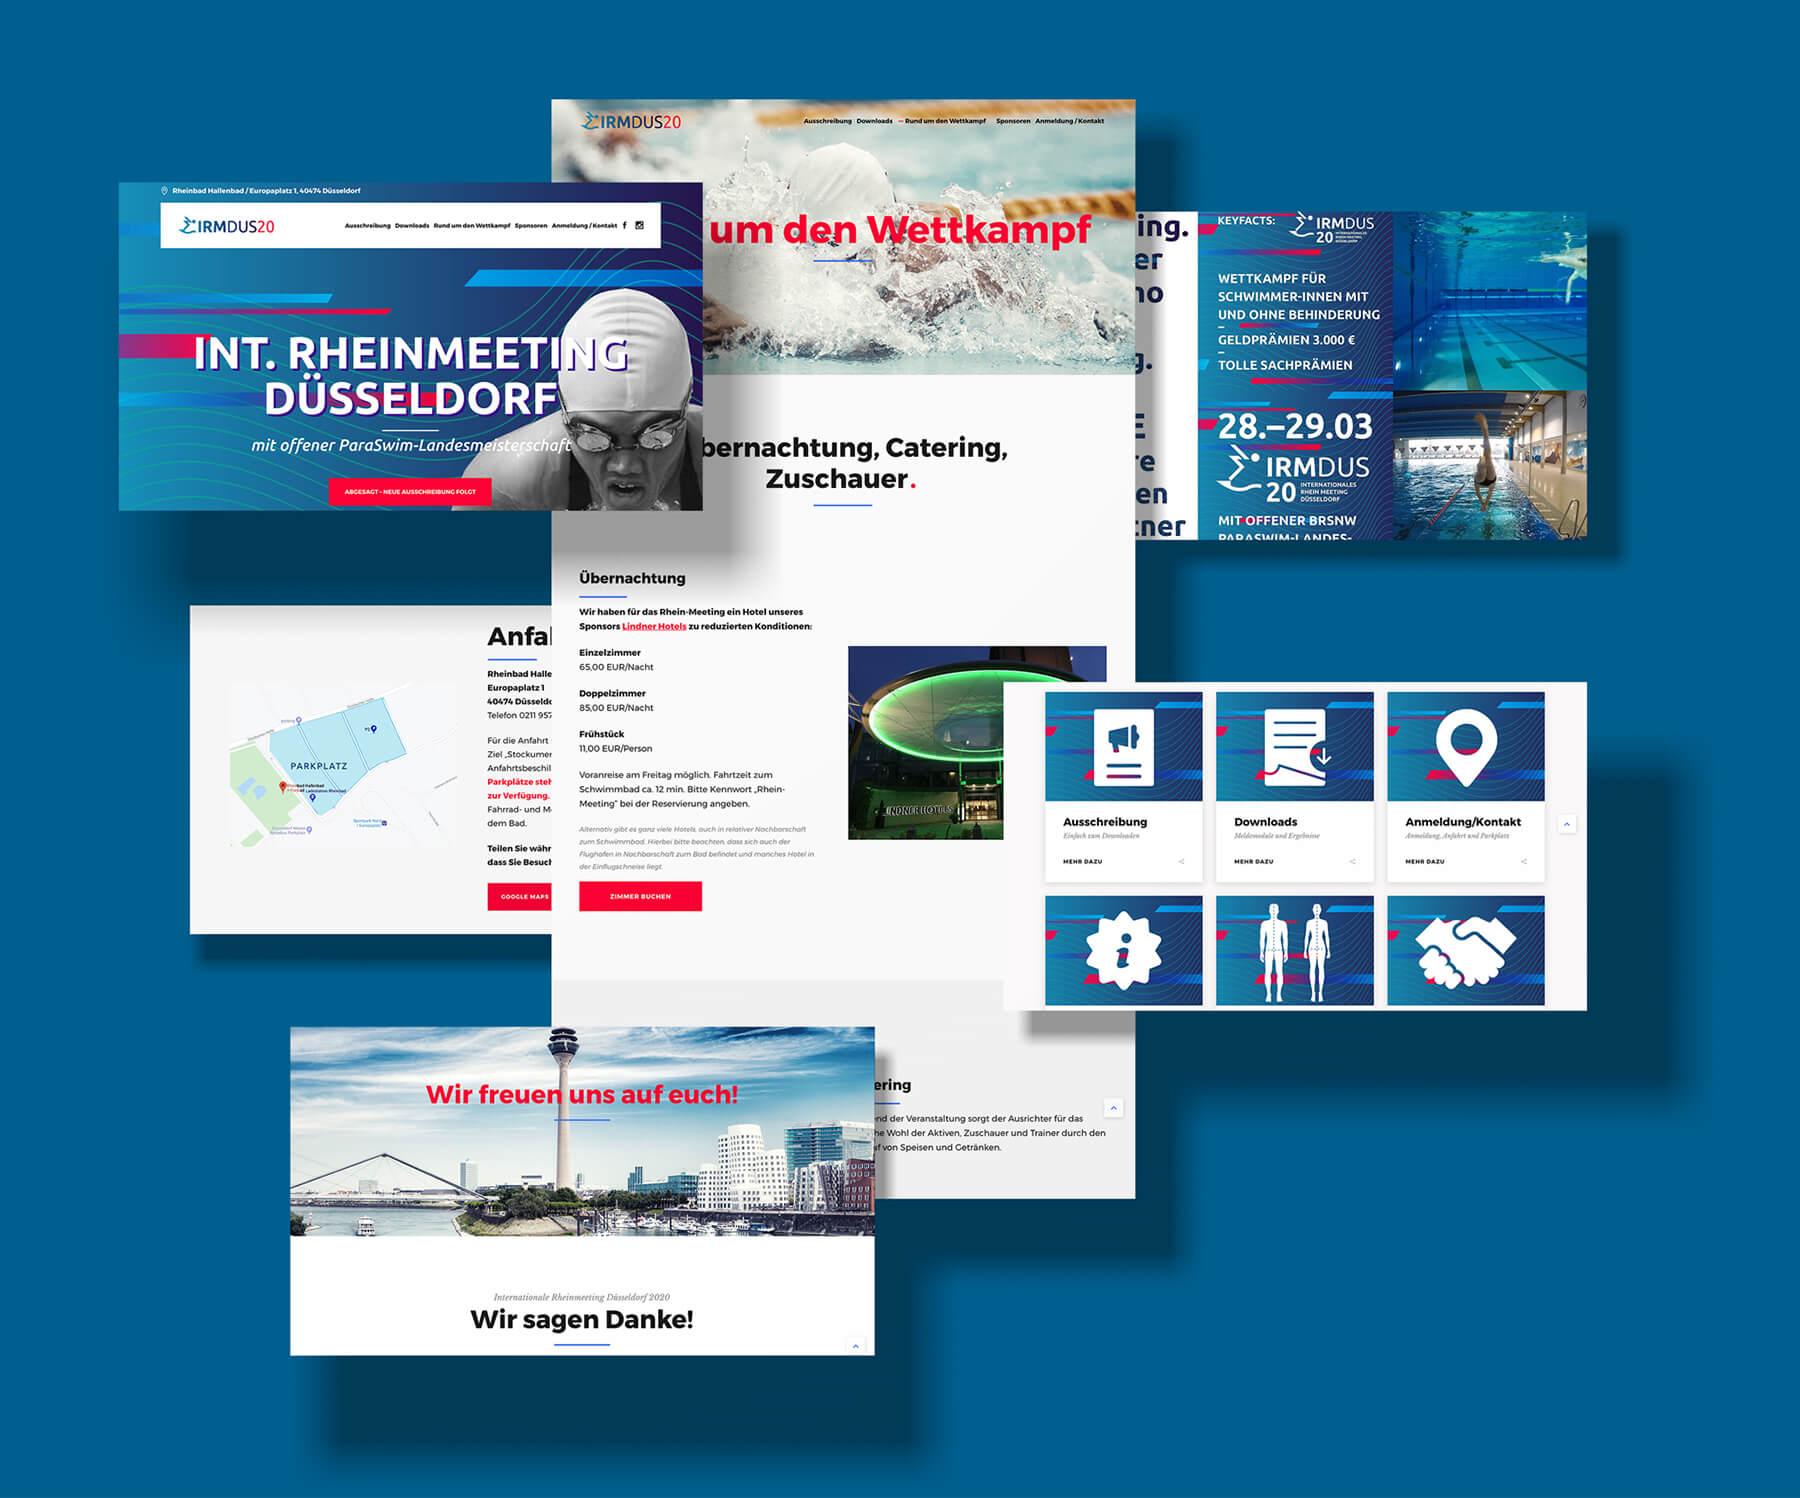 IRM DUS Logo Internationales Rheinmeeting Düsseldorf Eventmarketing Sport Website Webdesign Online Marketing